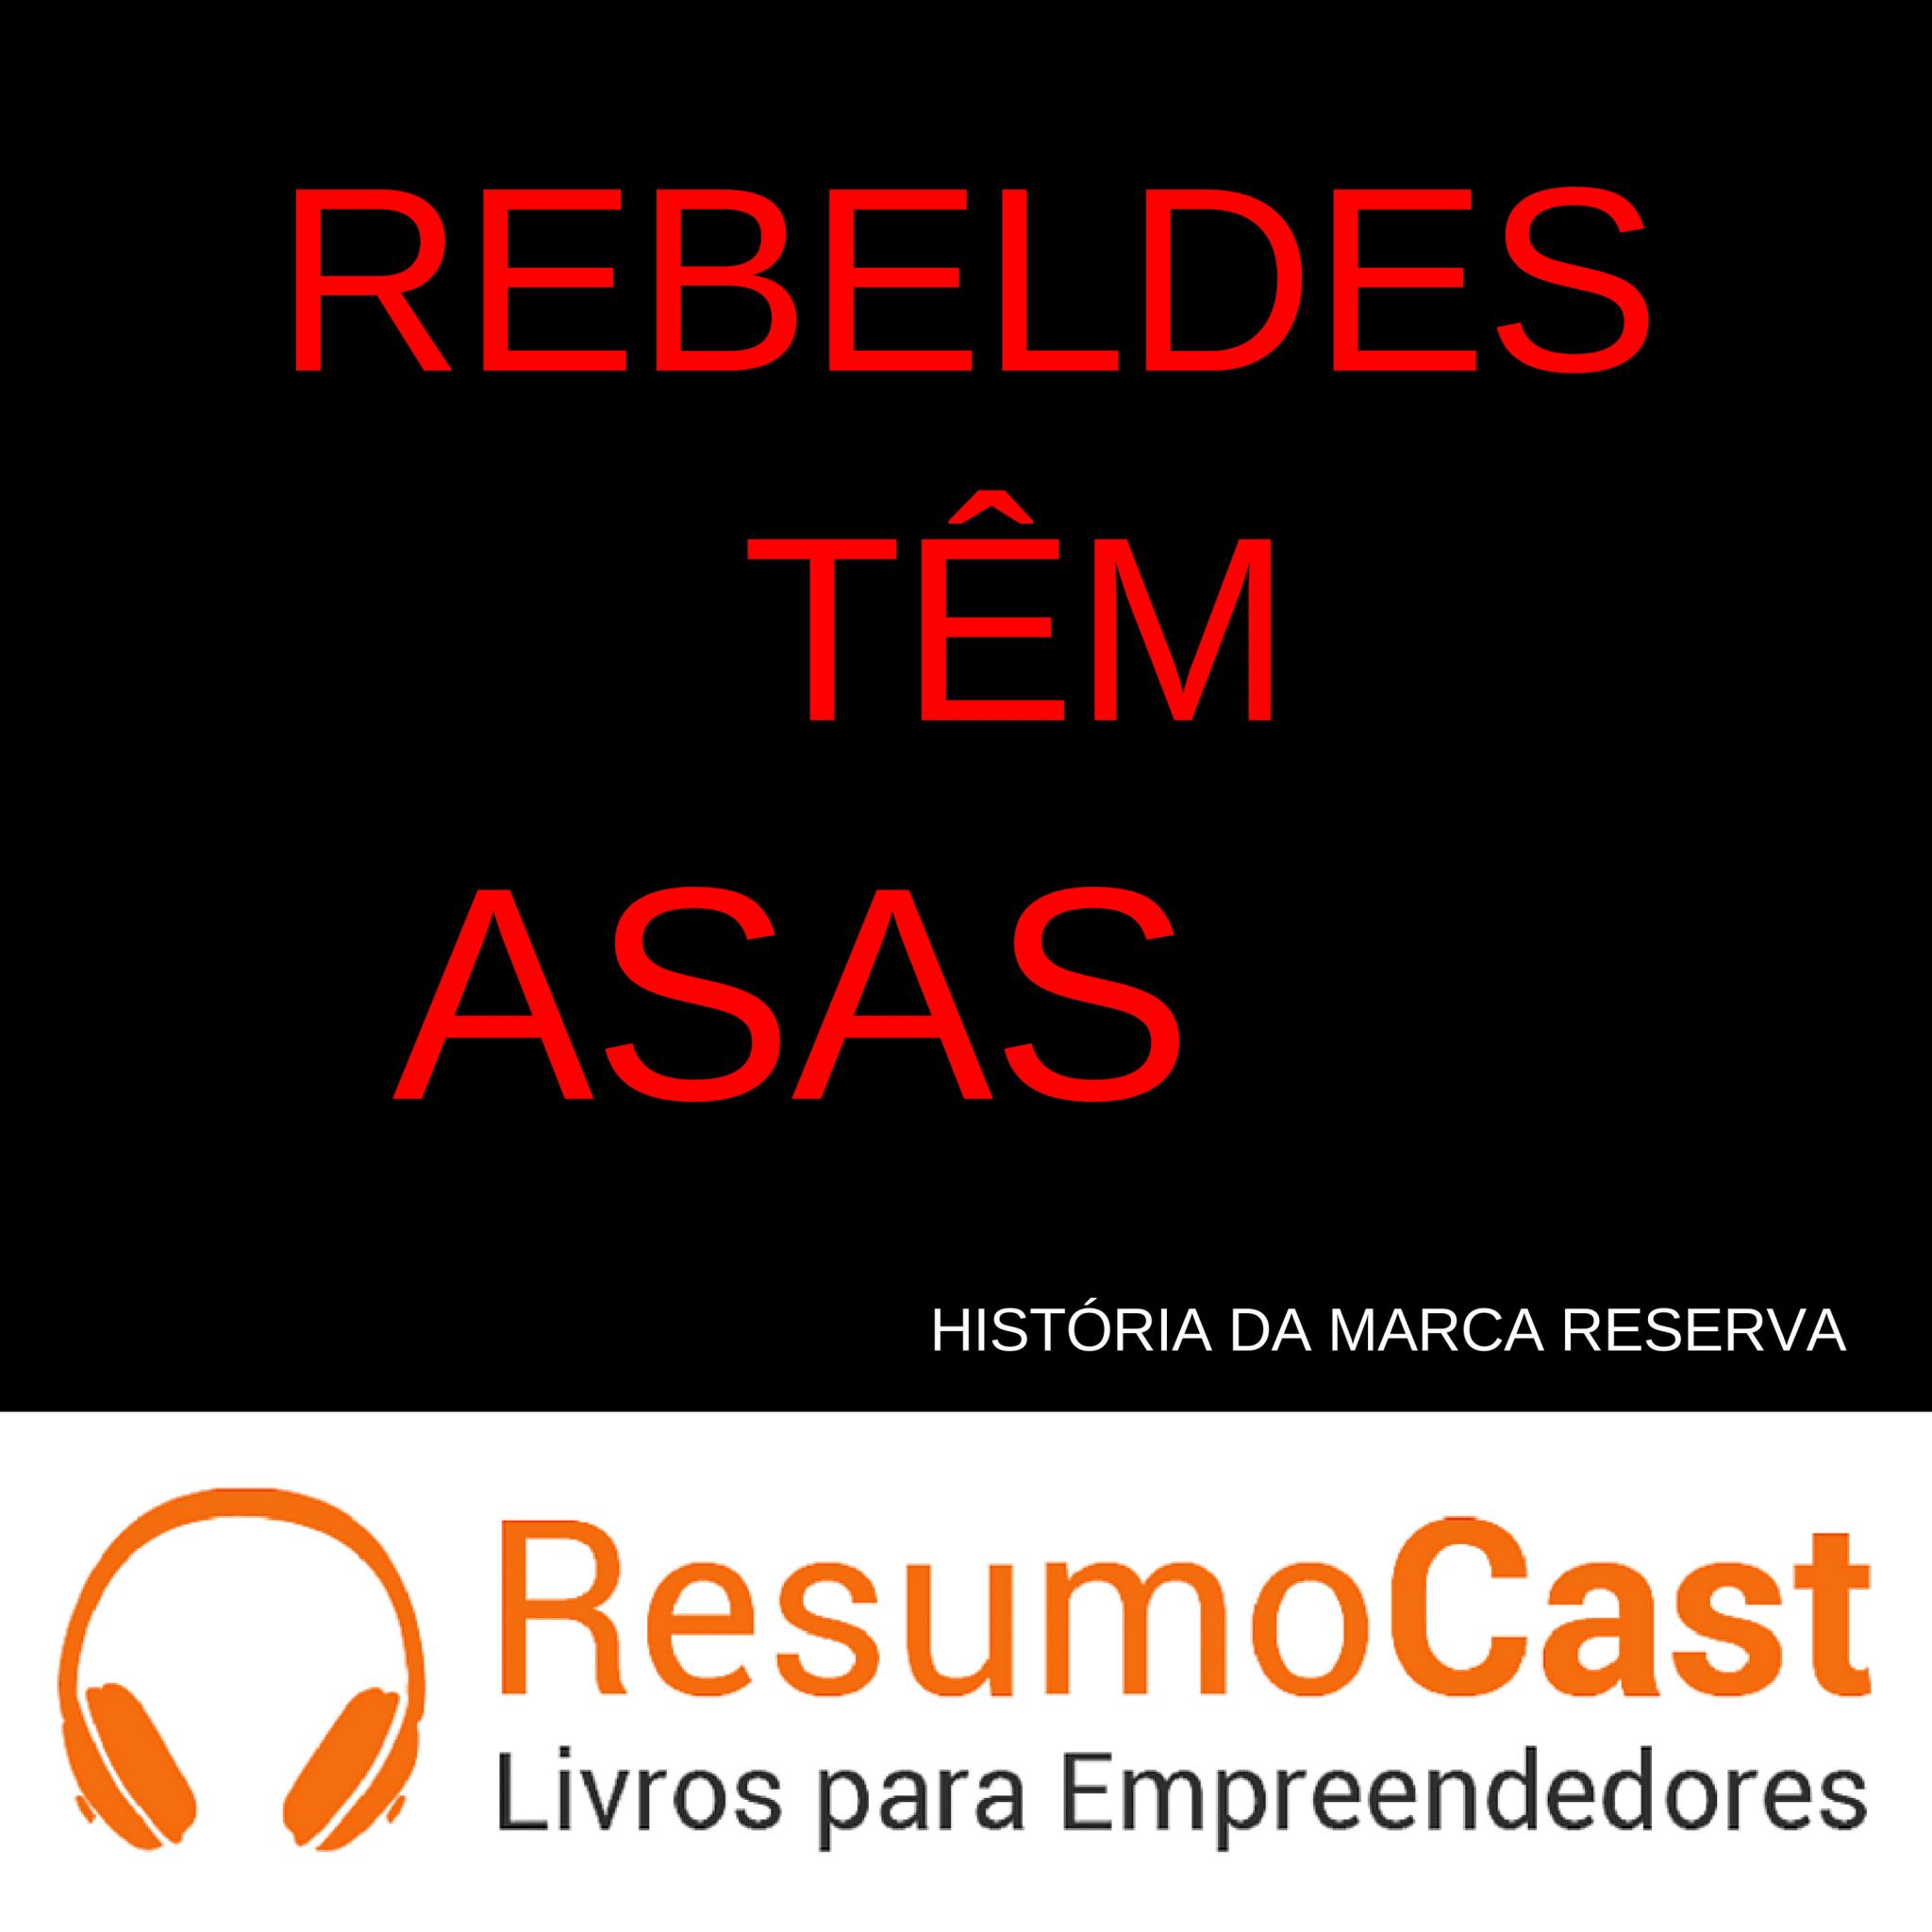 Rebeldes têm Asas – Rony Meisler | T1#092